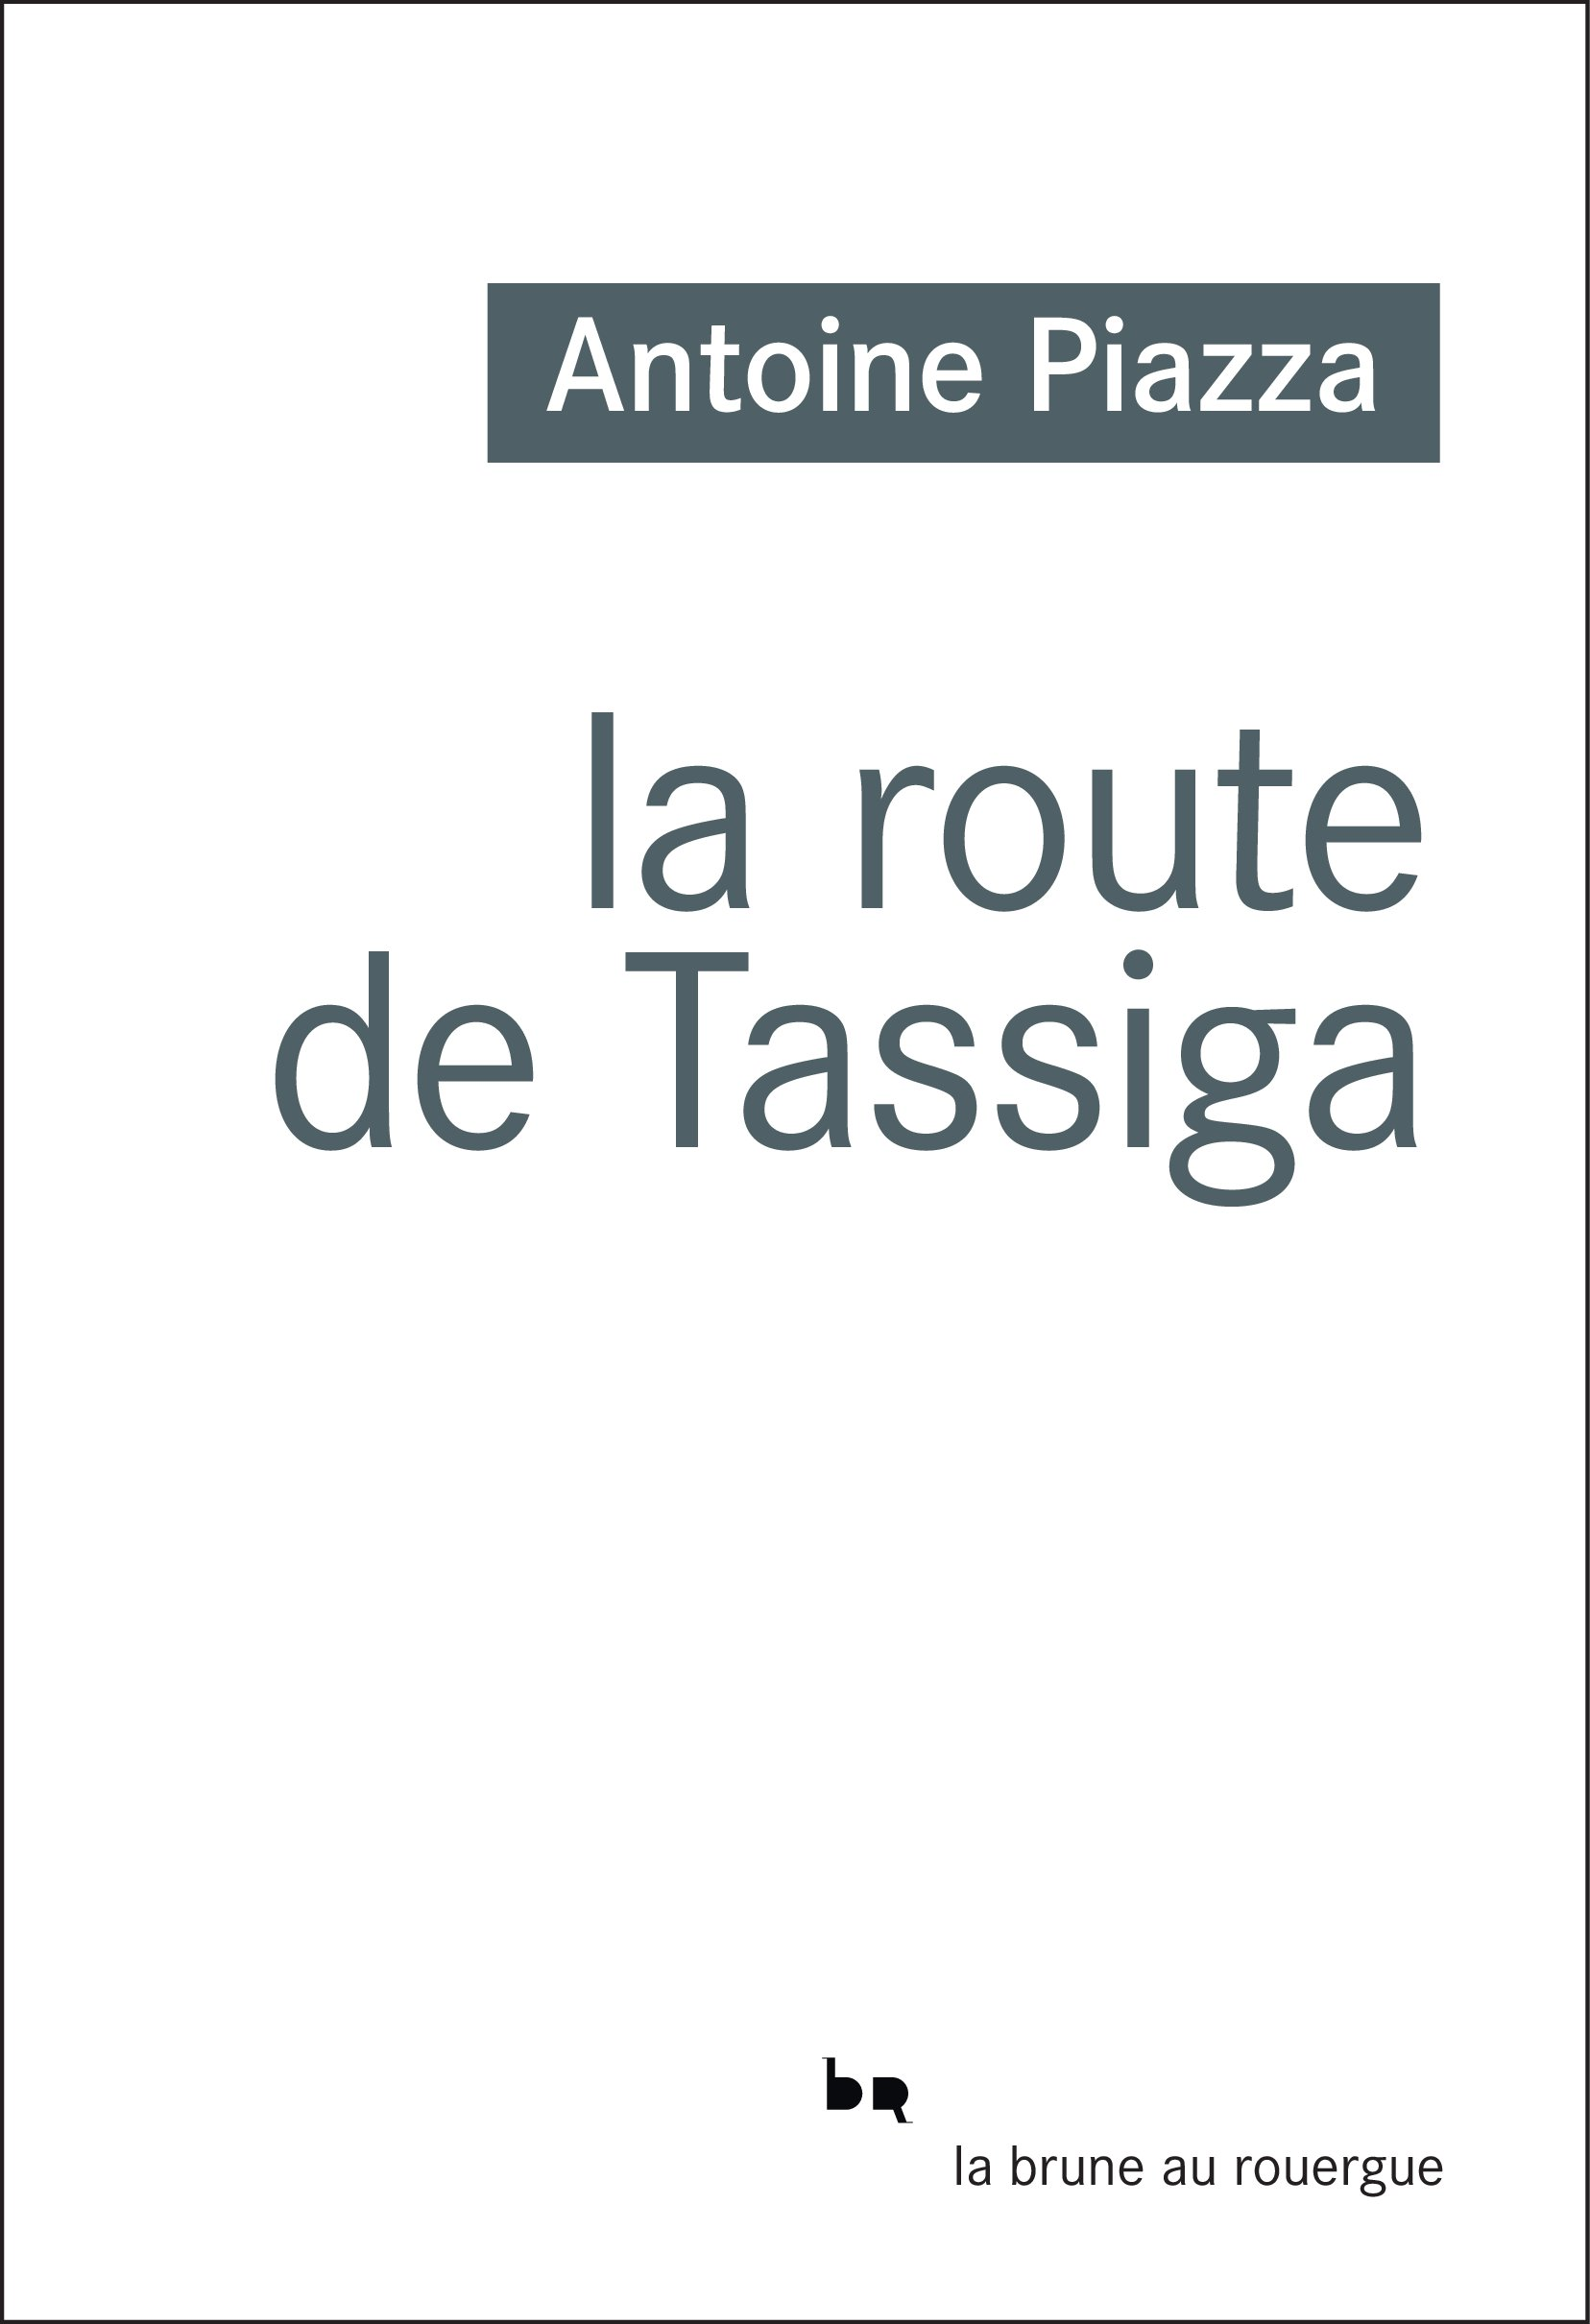 La route de Tassiga